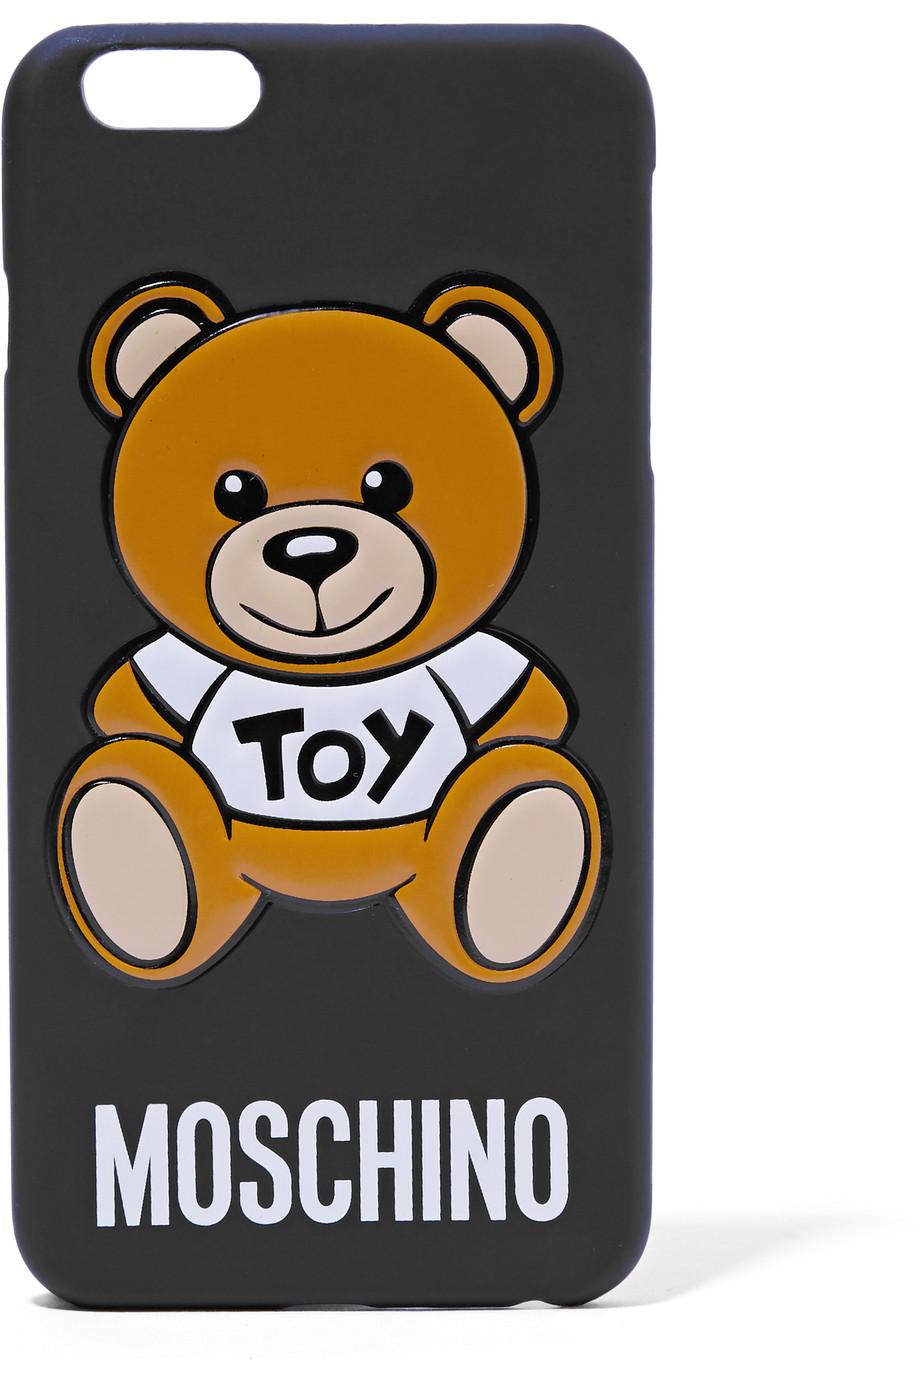 Moschino Silicone Iphone 6+ Case